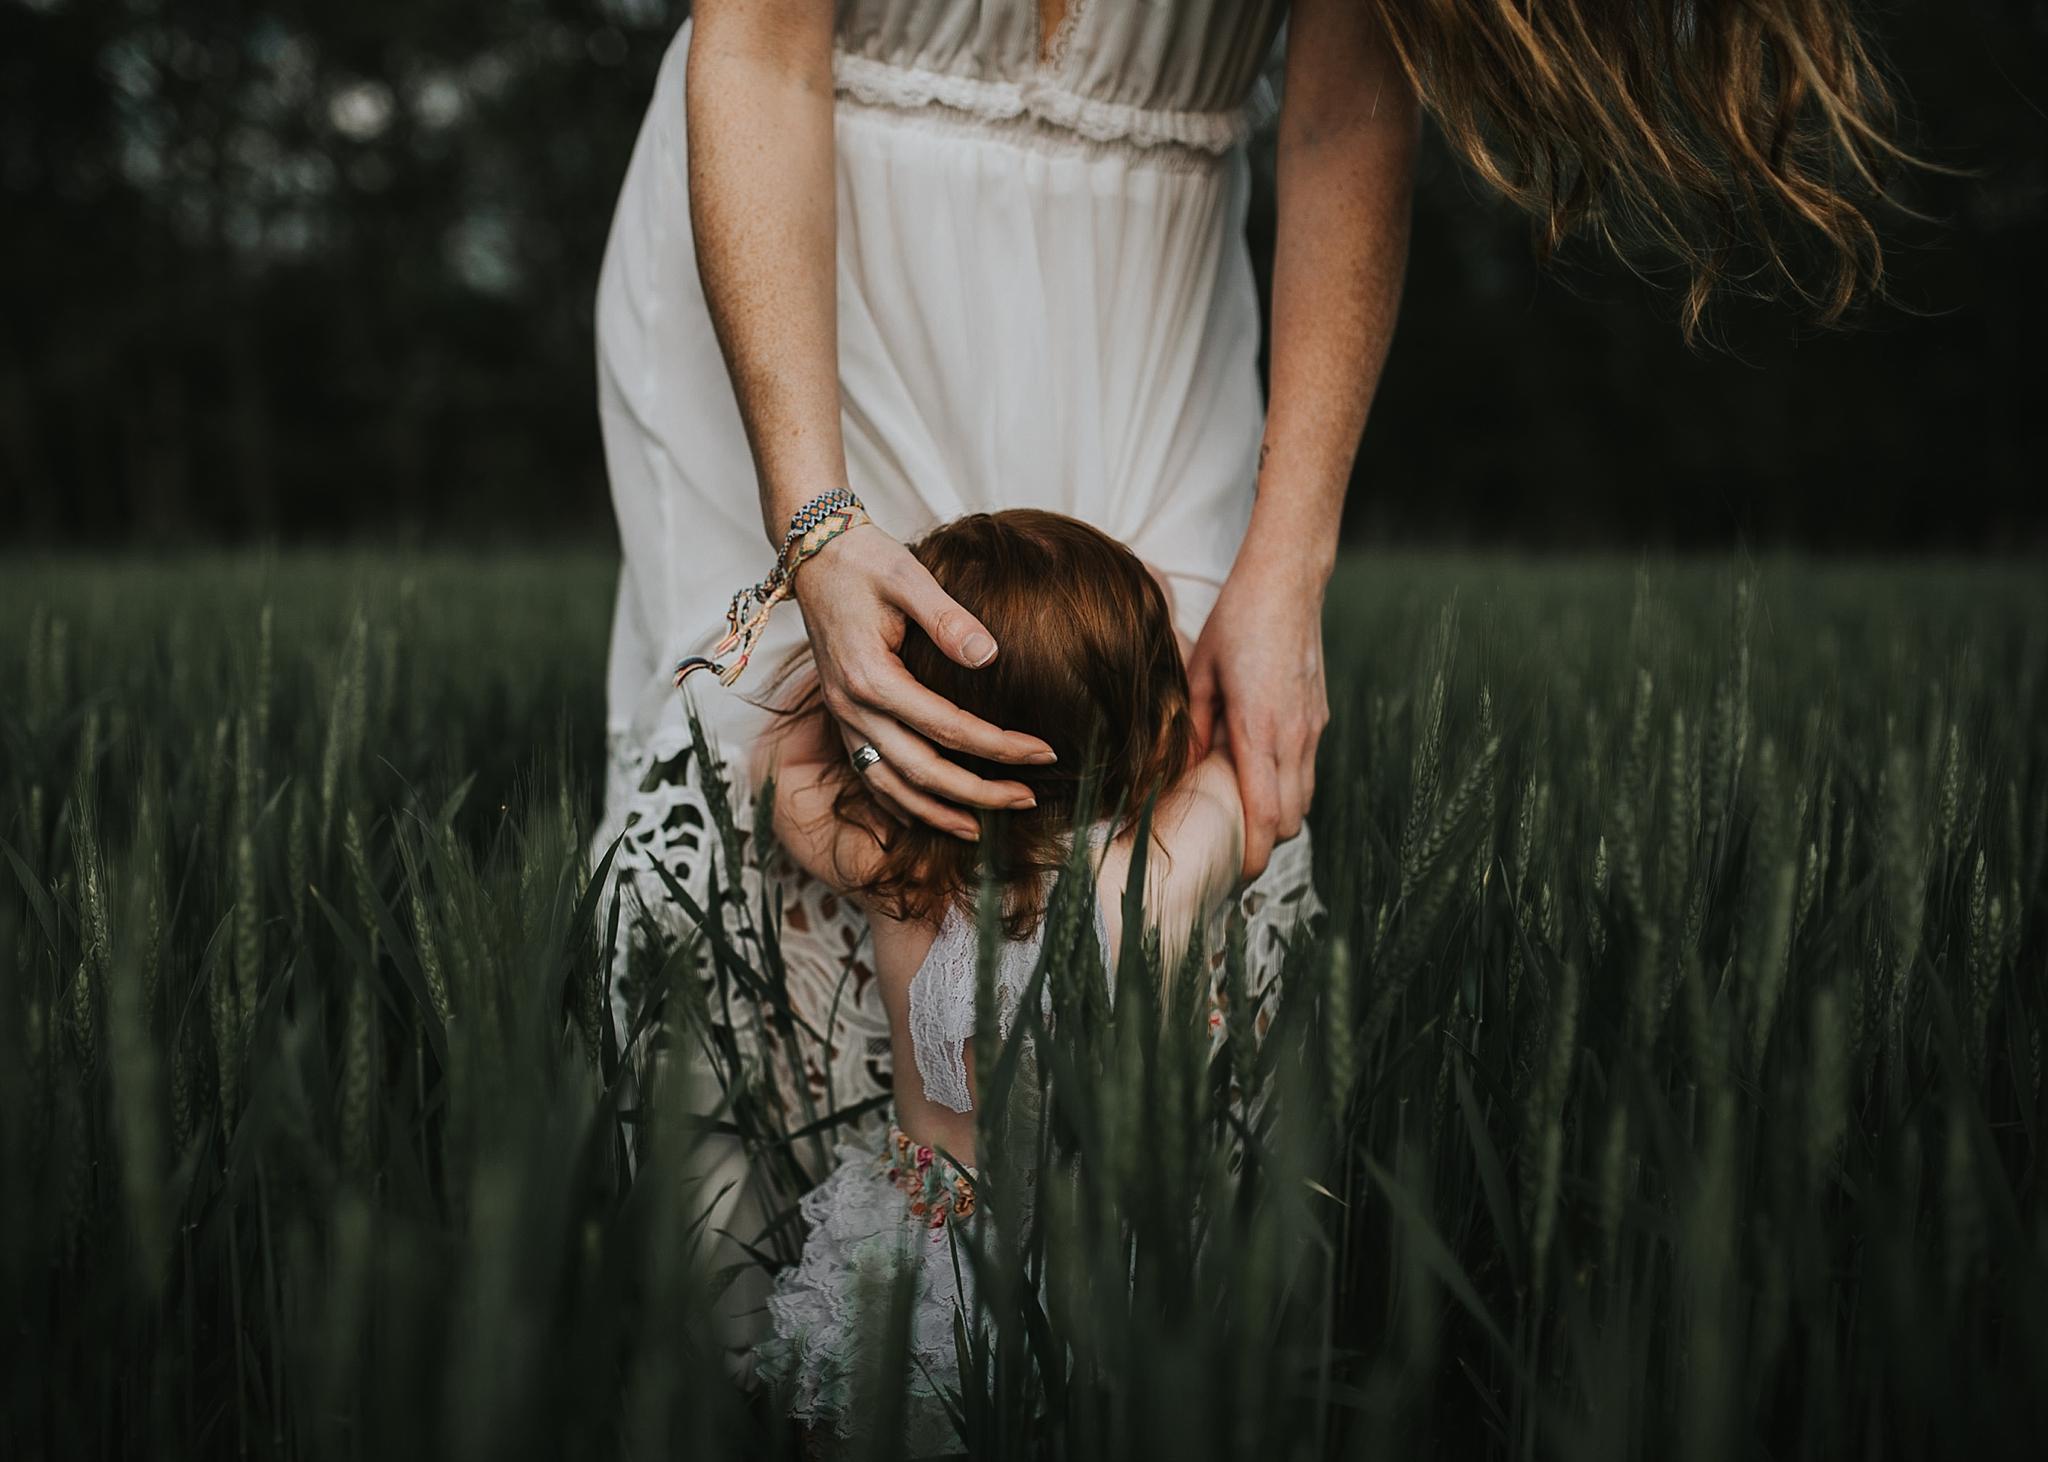 twyla jones photography - mother daughter - field and forest-4306_treasure coast florida.jpg